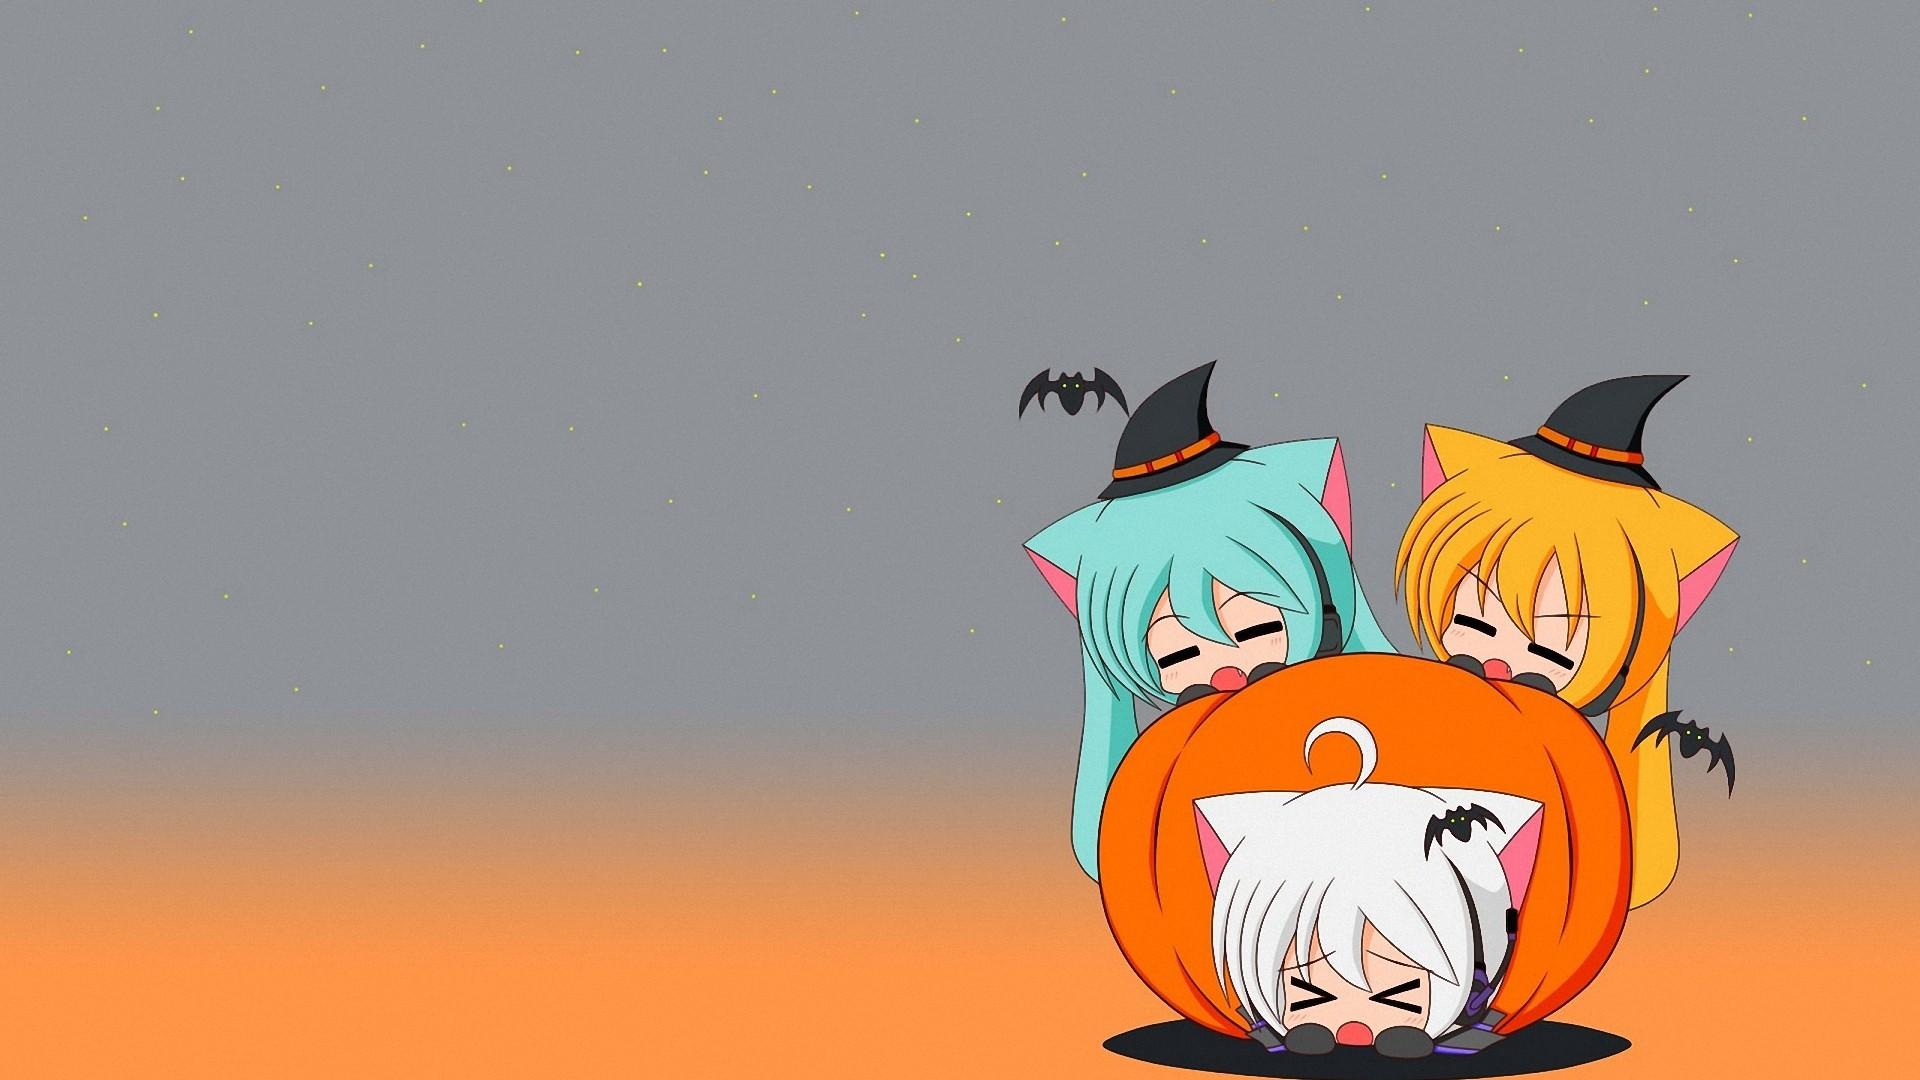 cartoon halloween anime girl 1080P full HD wallpapers